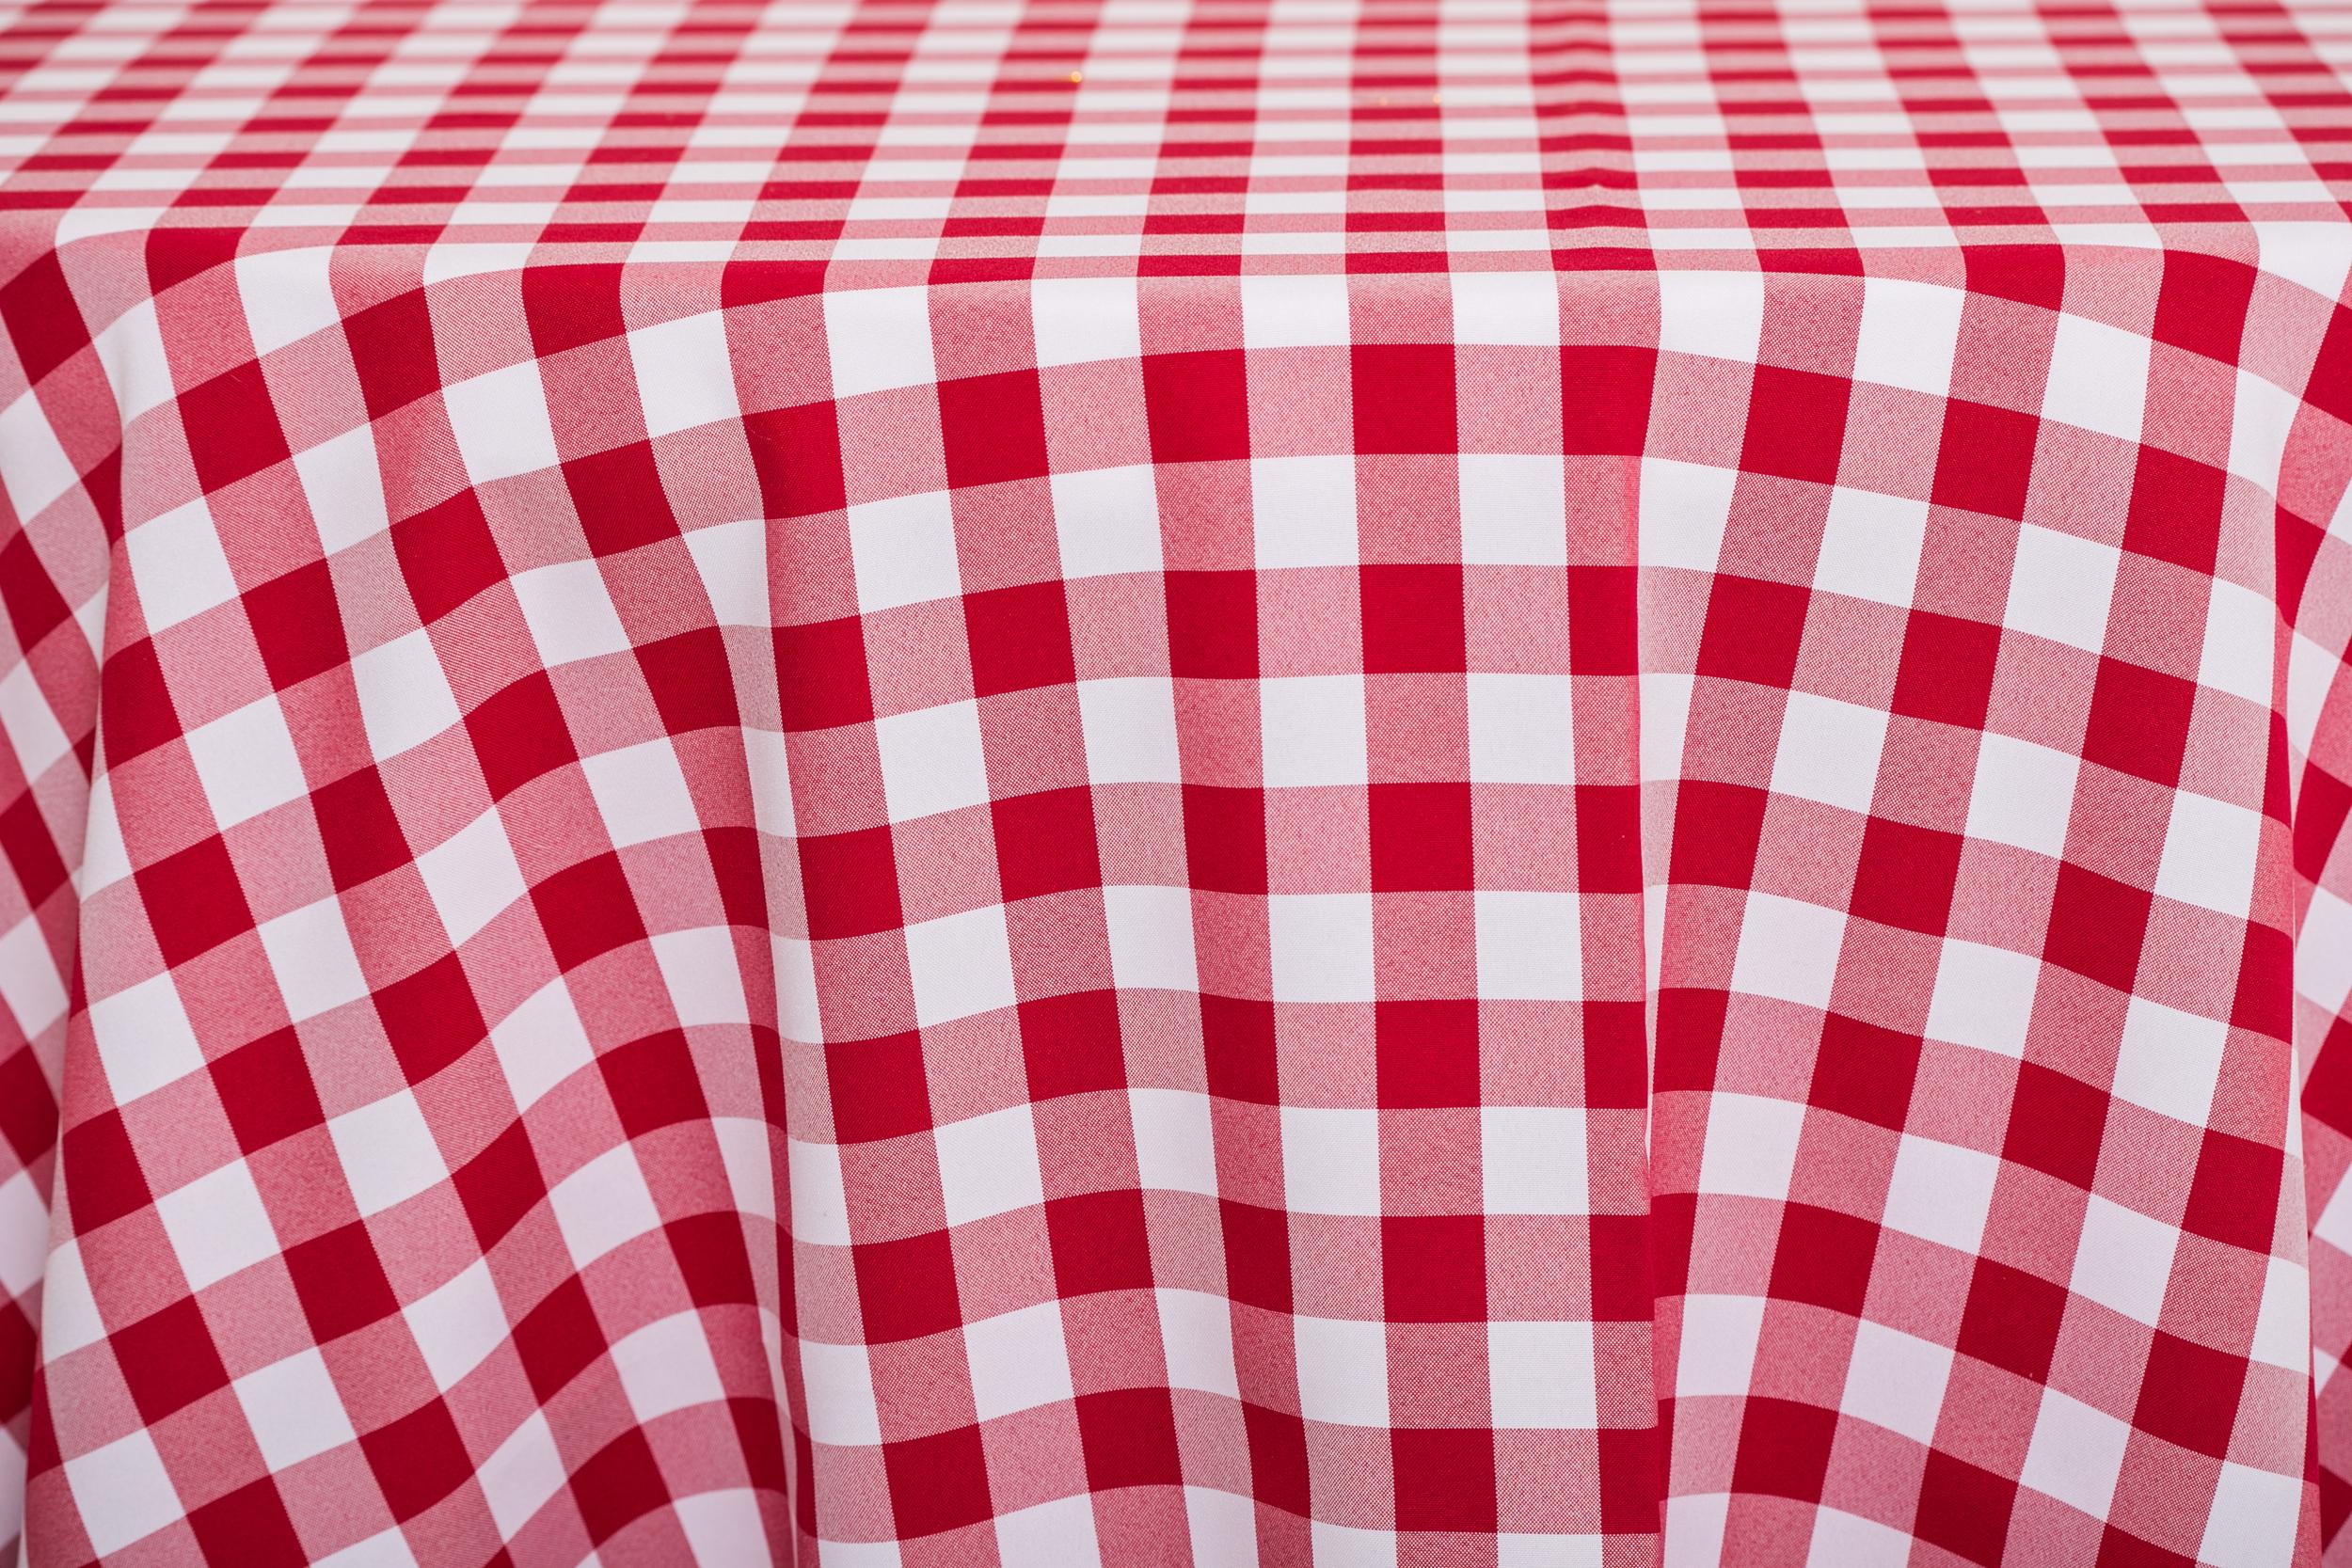 Checkered - Red/White